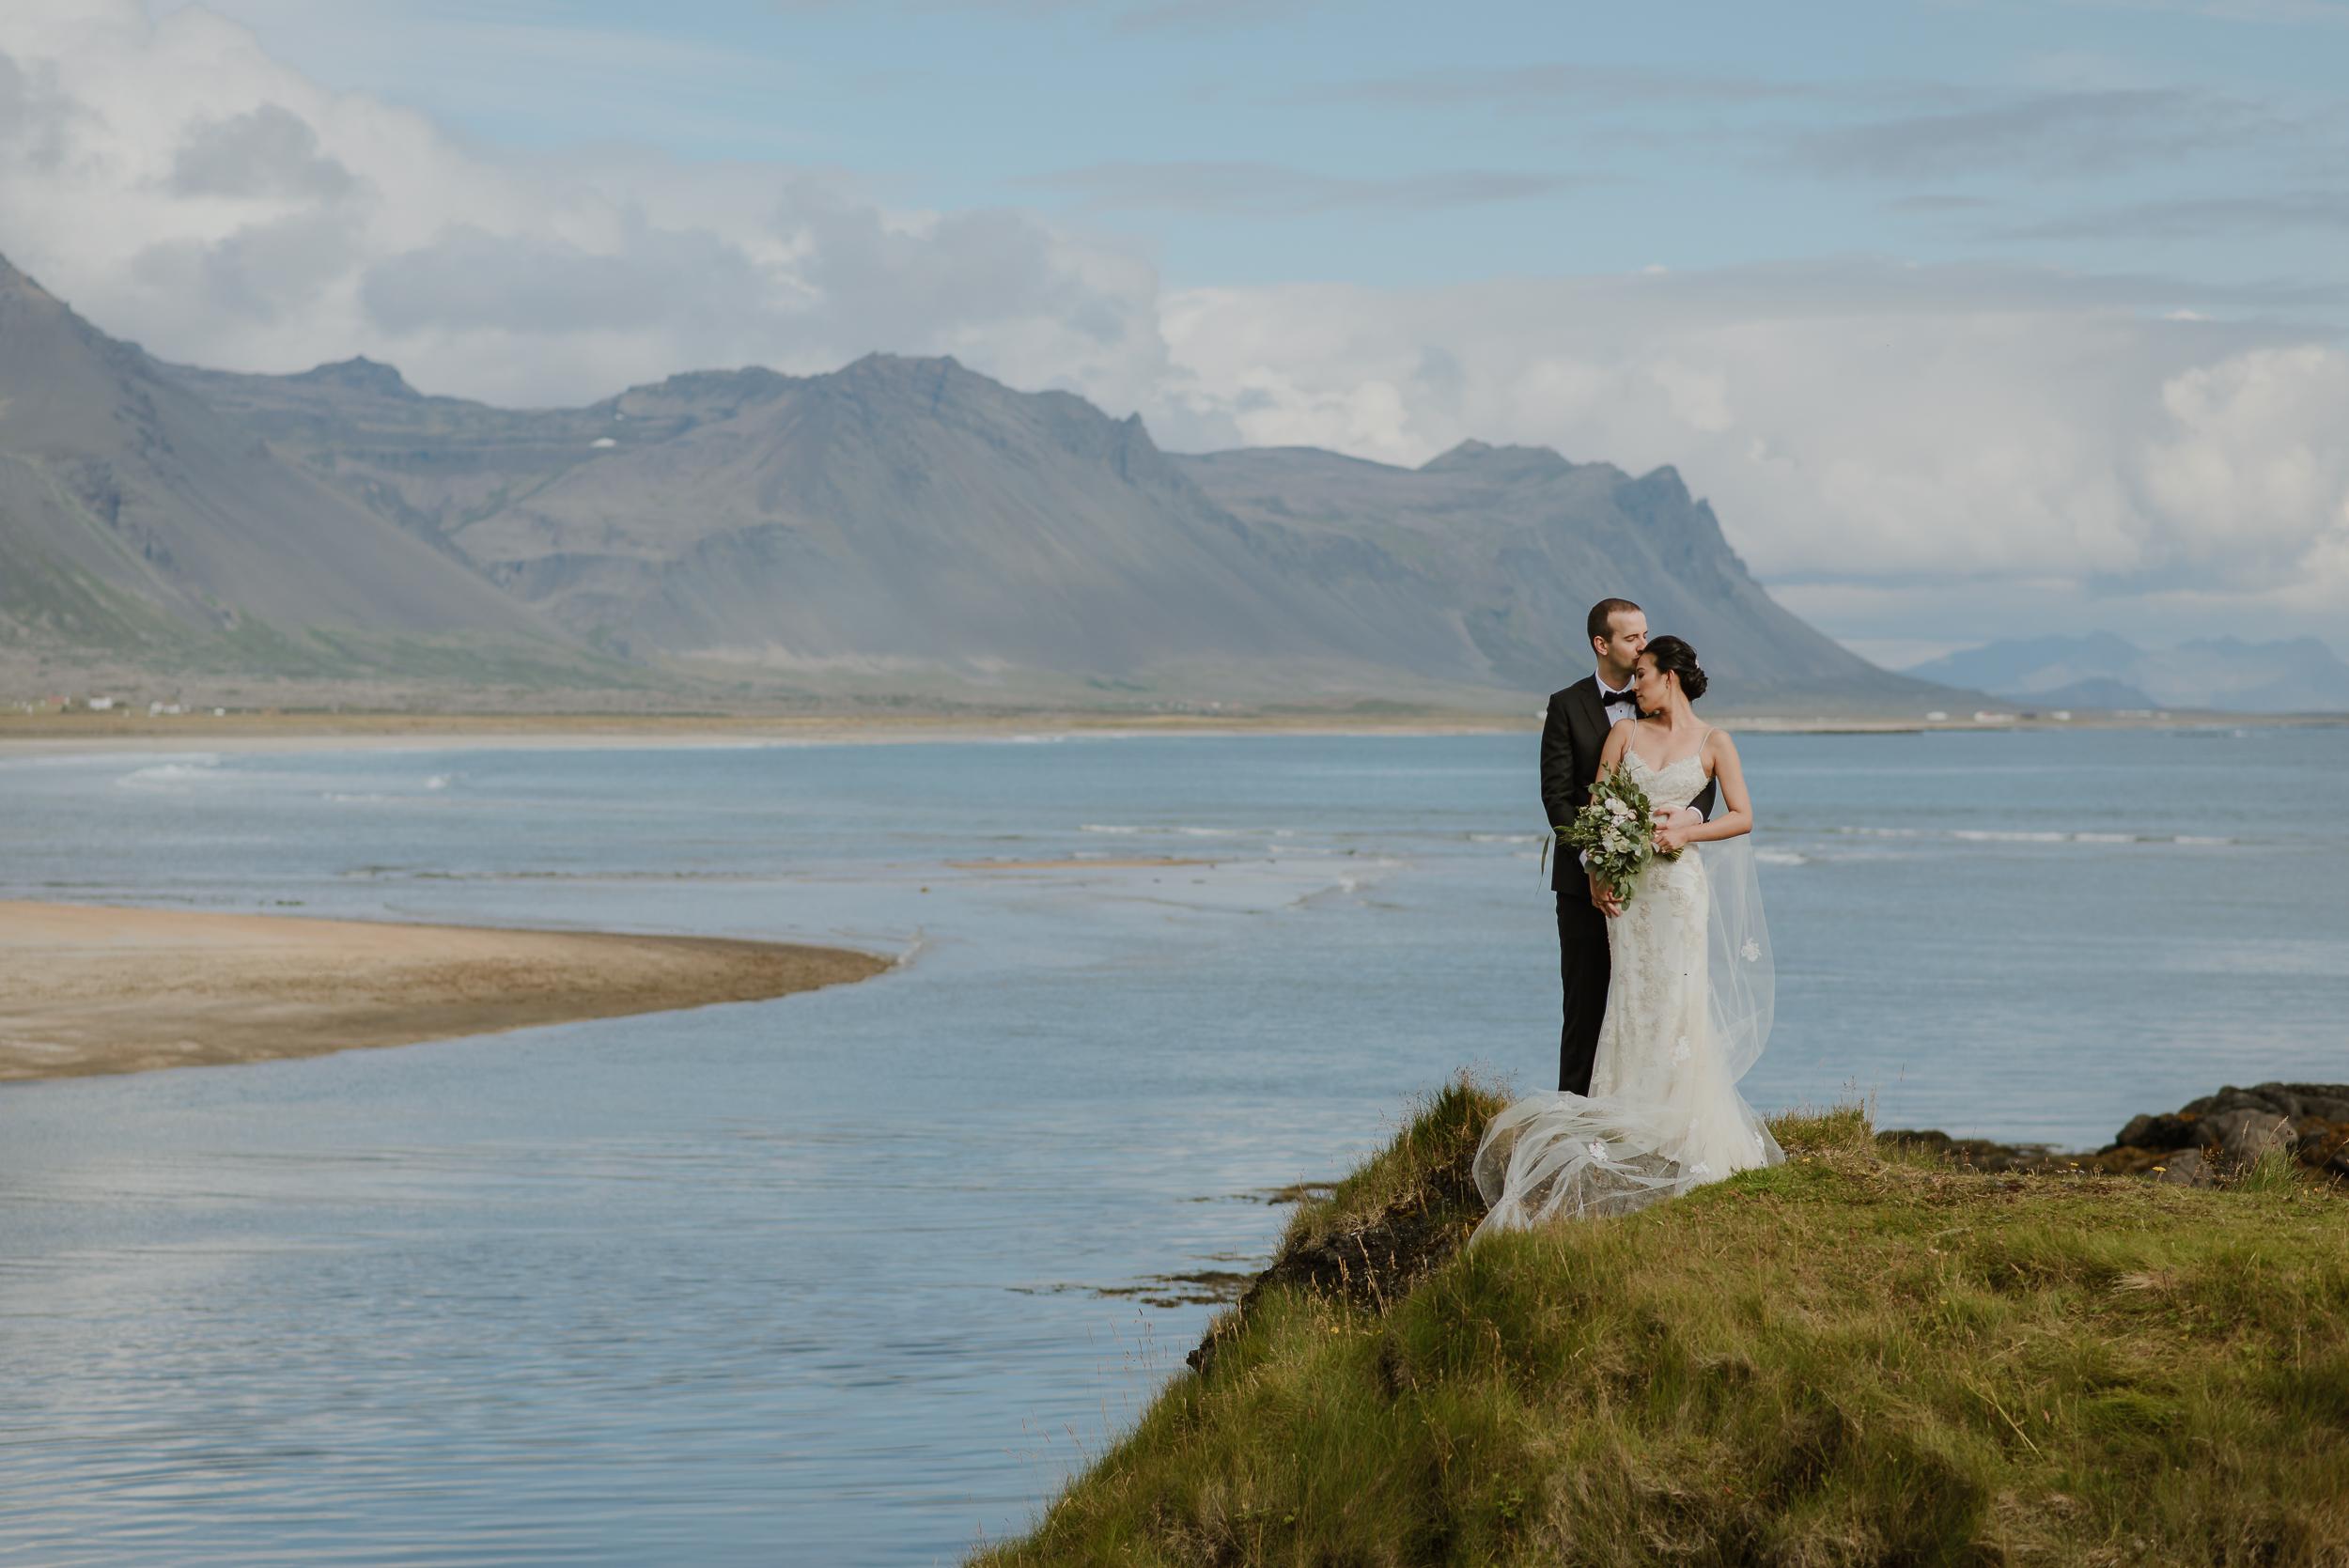 Vivian & Dragos on their wedding day on the Snaefellsnell Peninsula